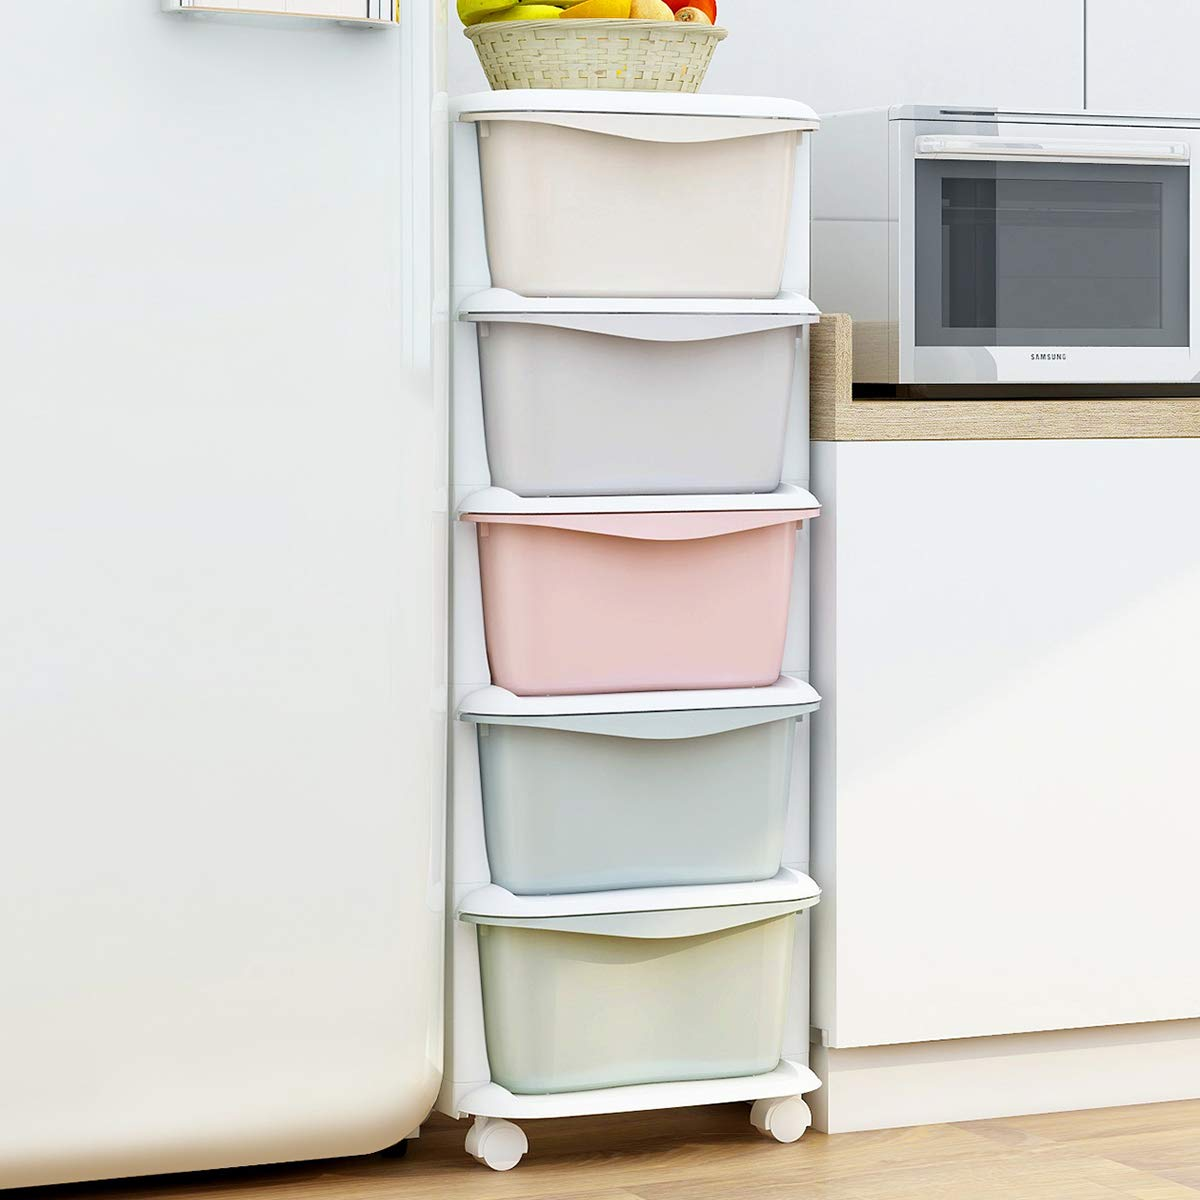 Nafenai Baby Storage Organizer, Cute Multicolor Drawer Storage Cart for Kids Bedroom, 5 Drawers-14.57'' L x 14.96'' W x 38.19'' H by Nafenai (Image #2)